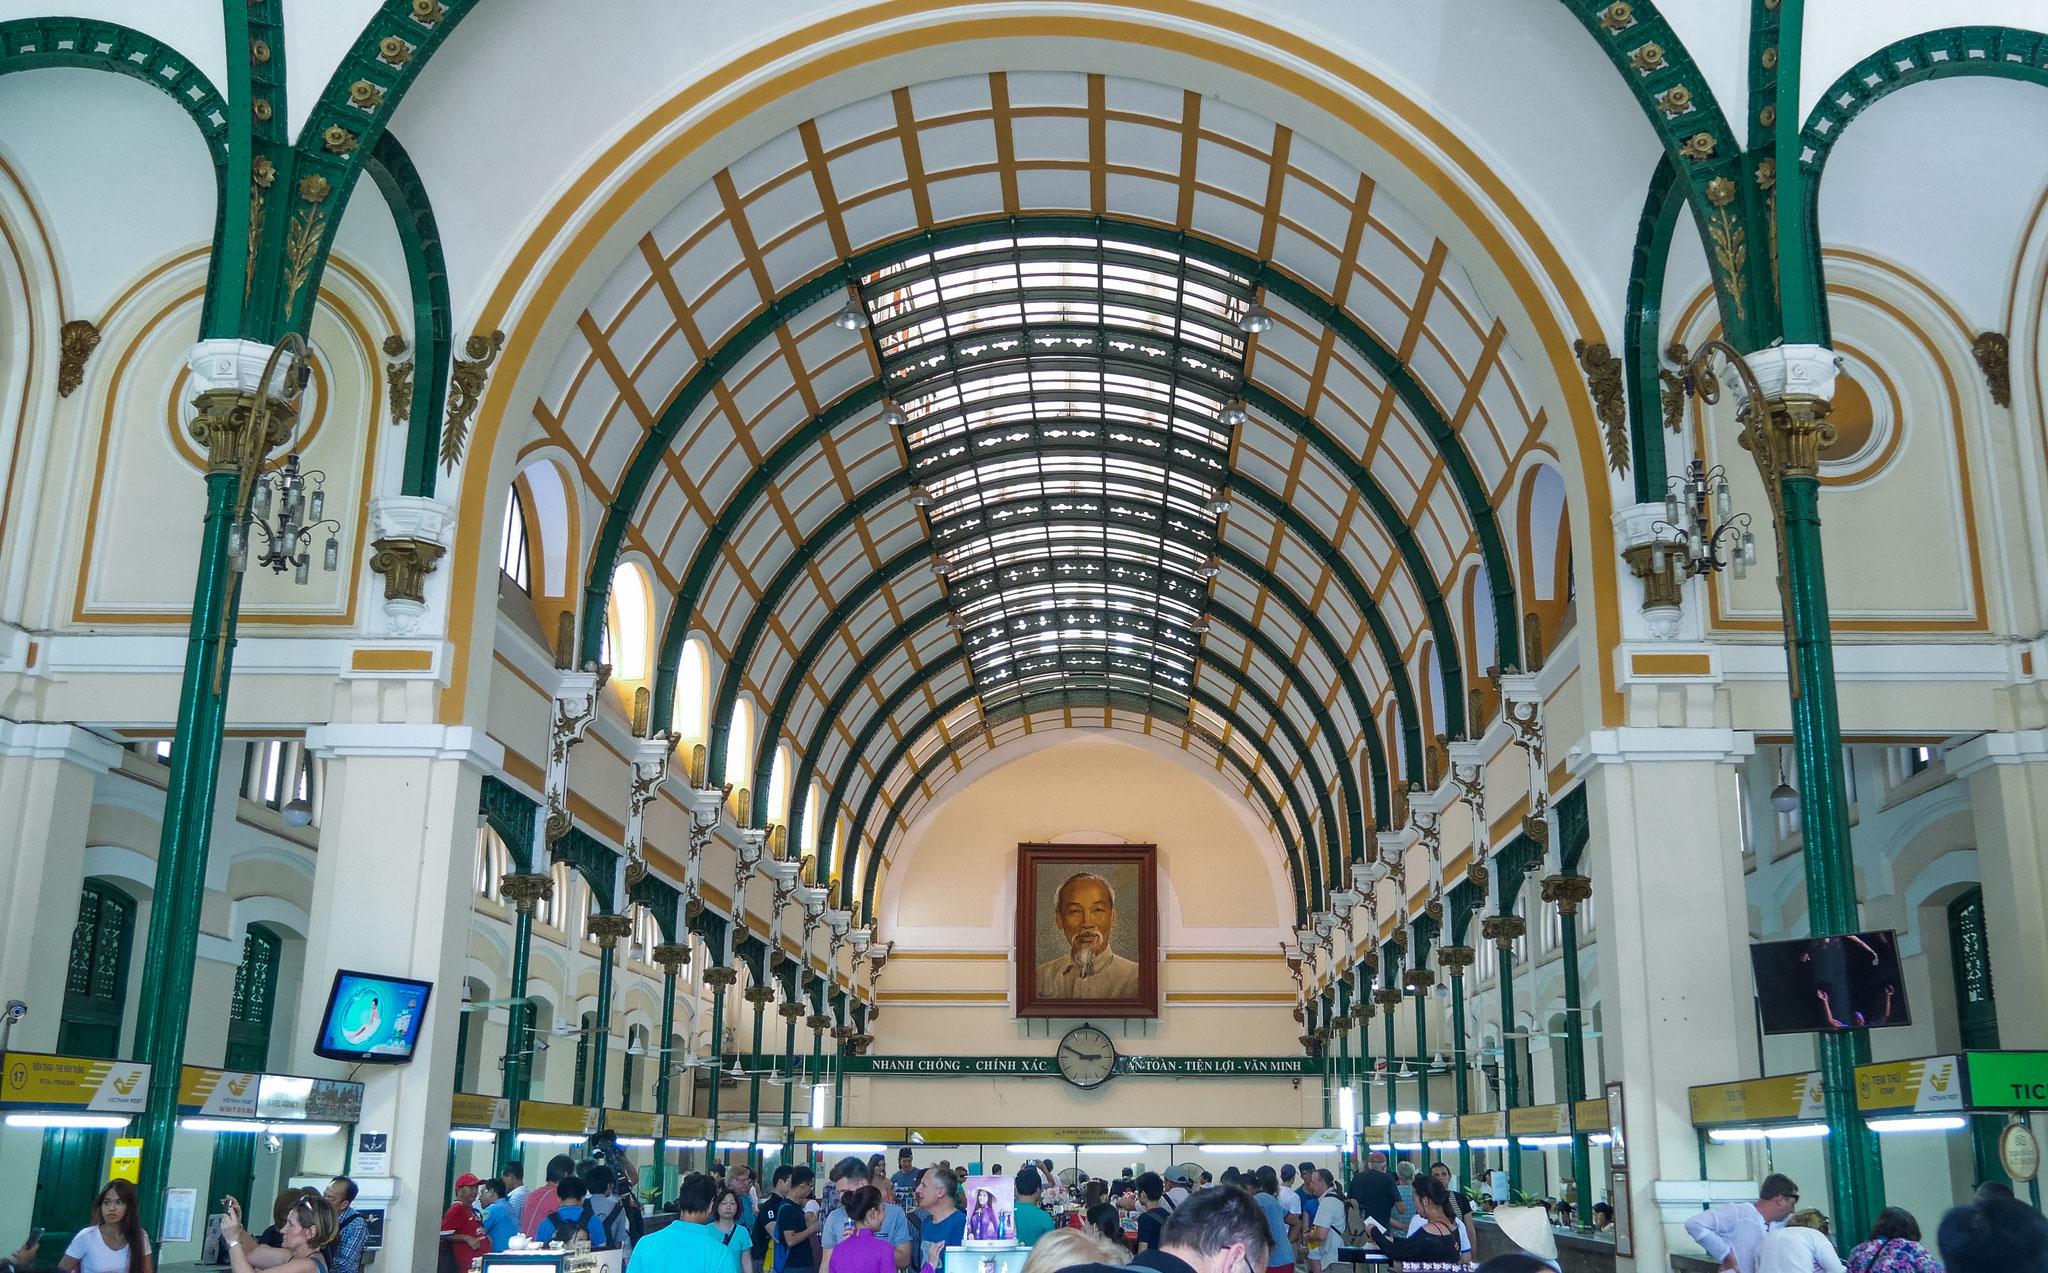 Ho-Chi-Minh-Stadt (Saigon) - Das Hauptpostamt